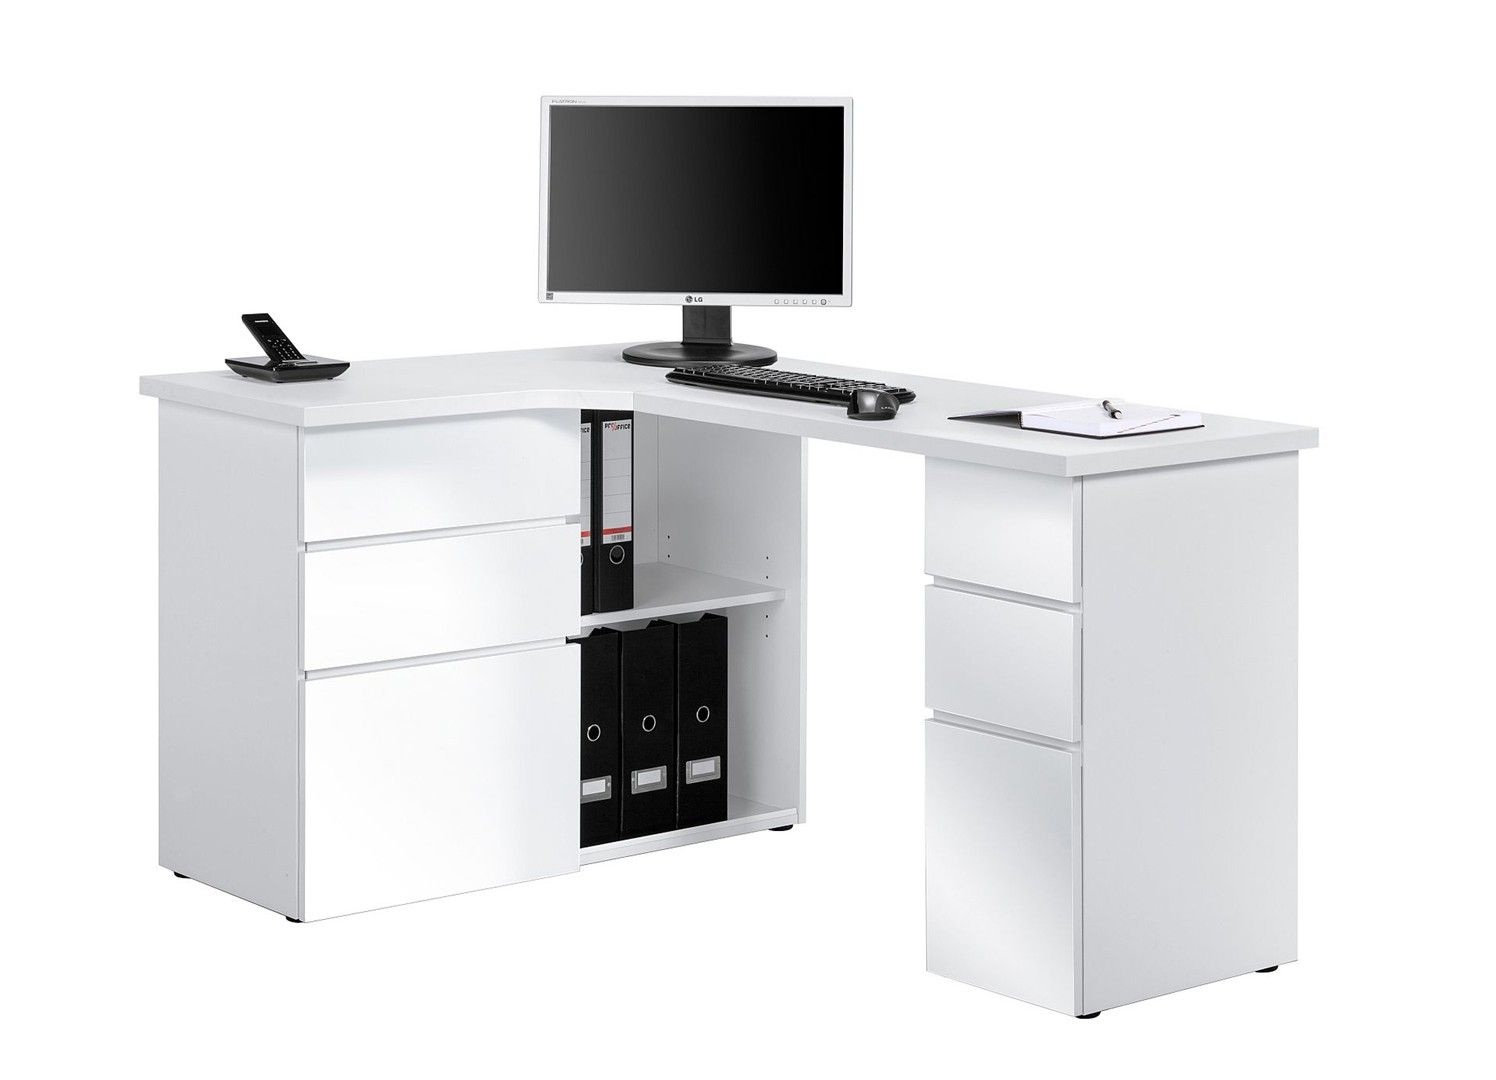 Bureau Informatique D Angle Contemporain Avec Rangement Blanc Brillant Nayade Matelpro Bureau Informatique Bureau Blanc Ikea Meuble Ordinateur